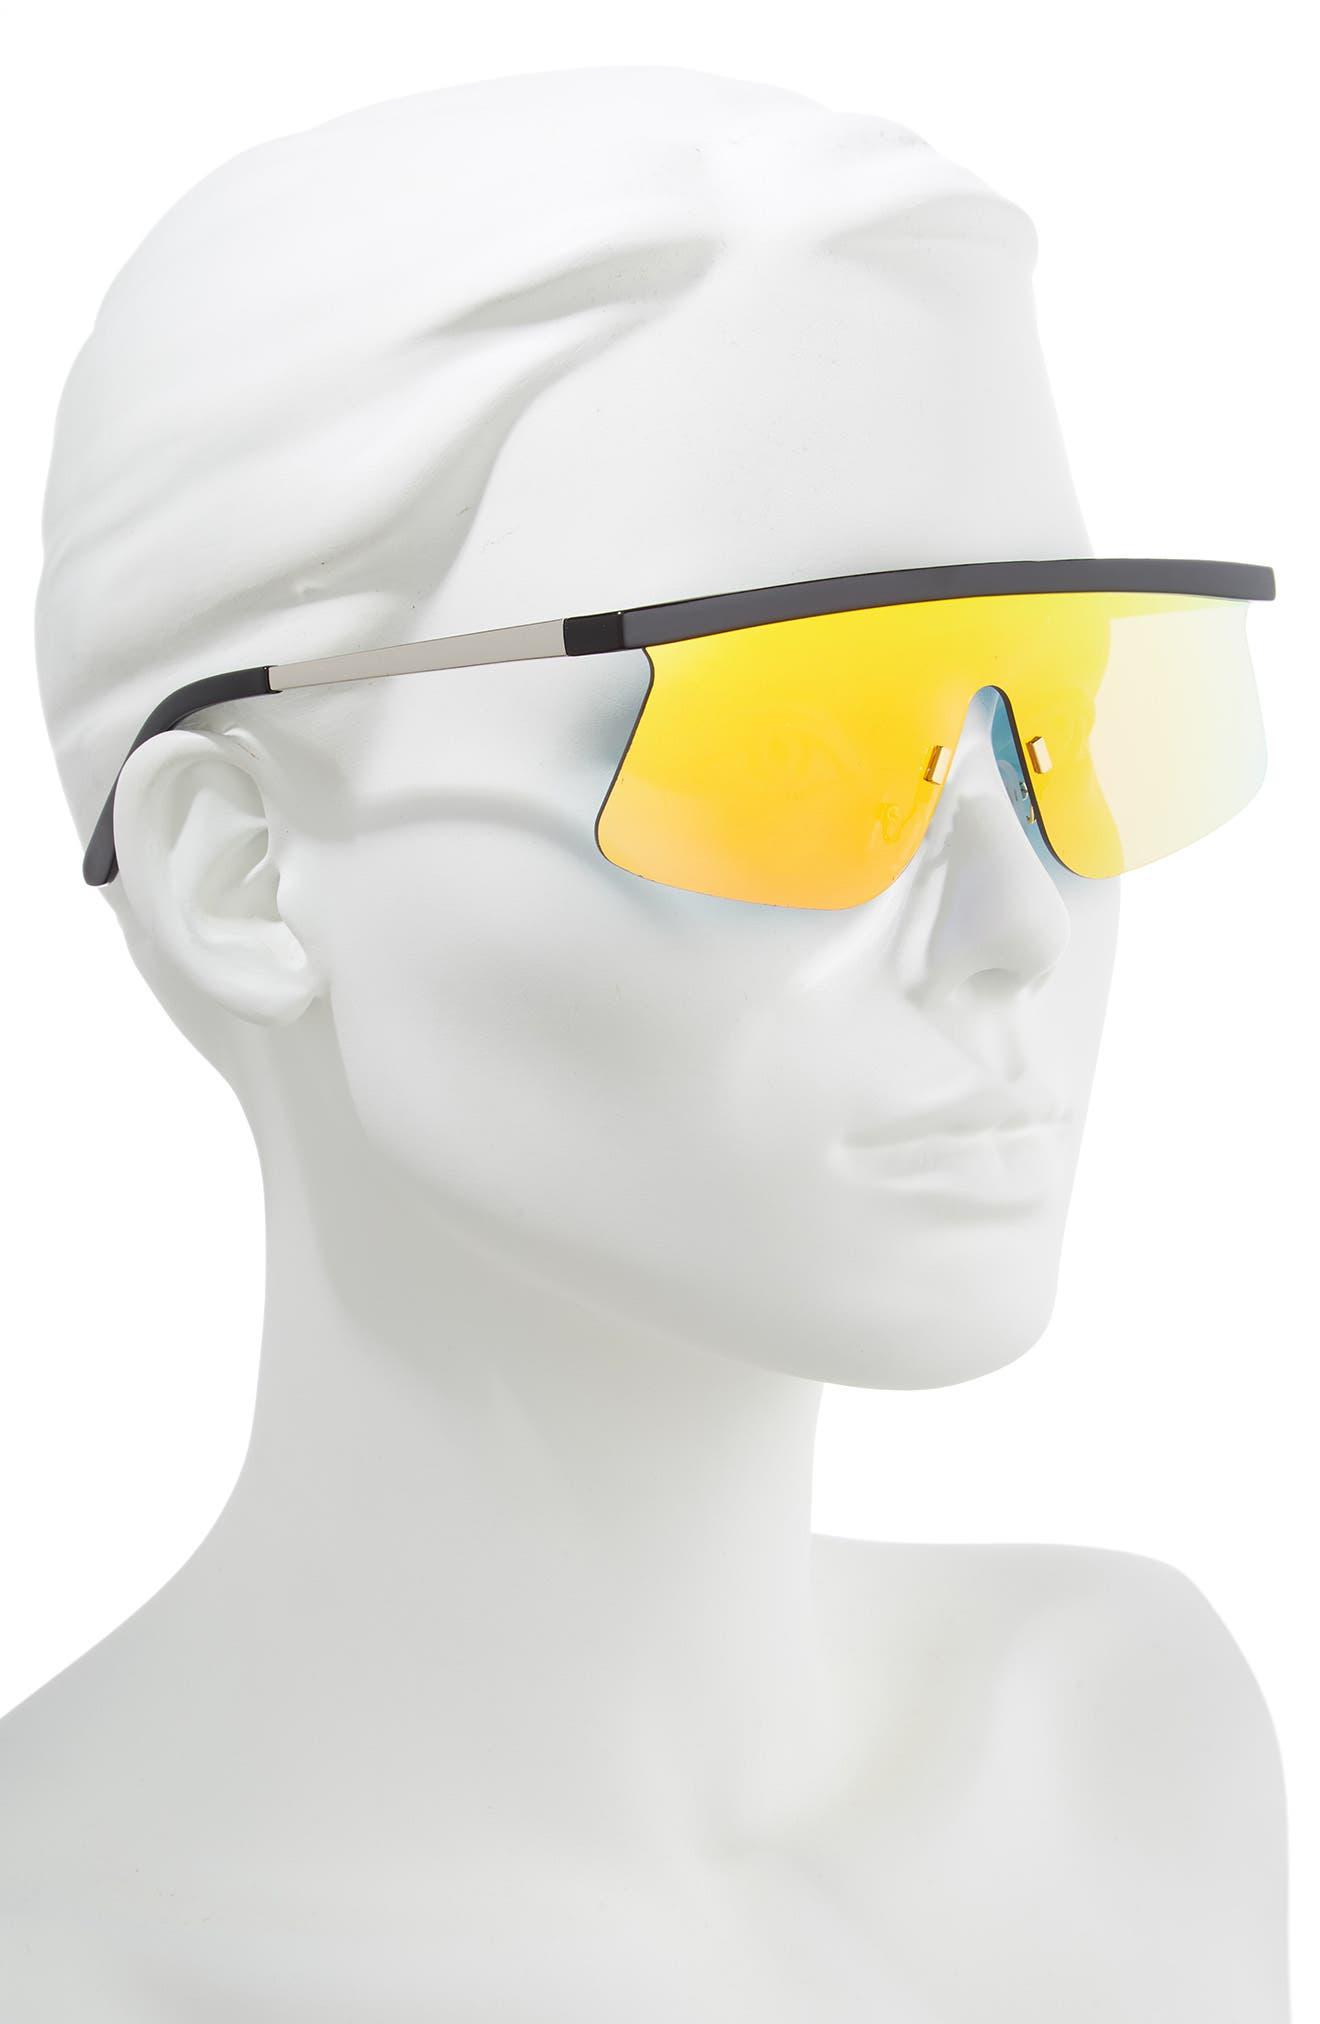 Brow Bar Shield Sunglasses,                             Alternate thumbnail 2, color,                             BLACK/ ORANGE